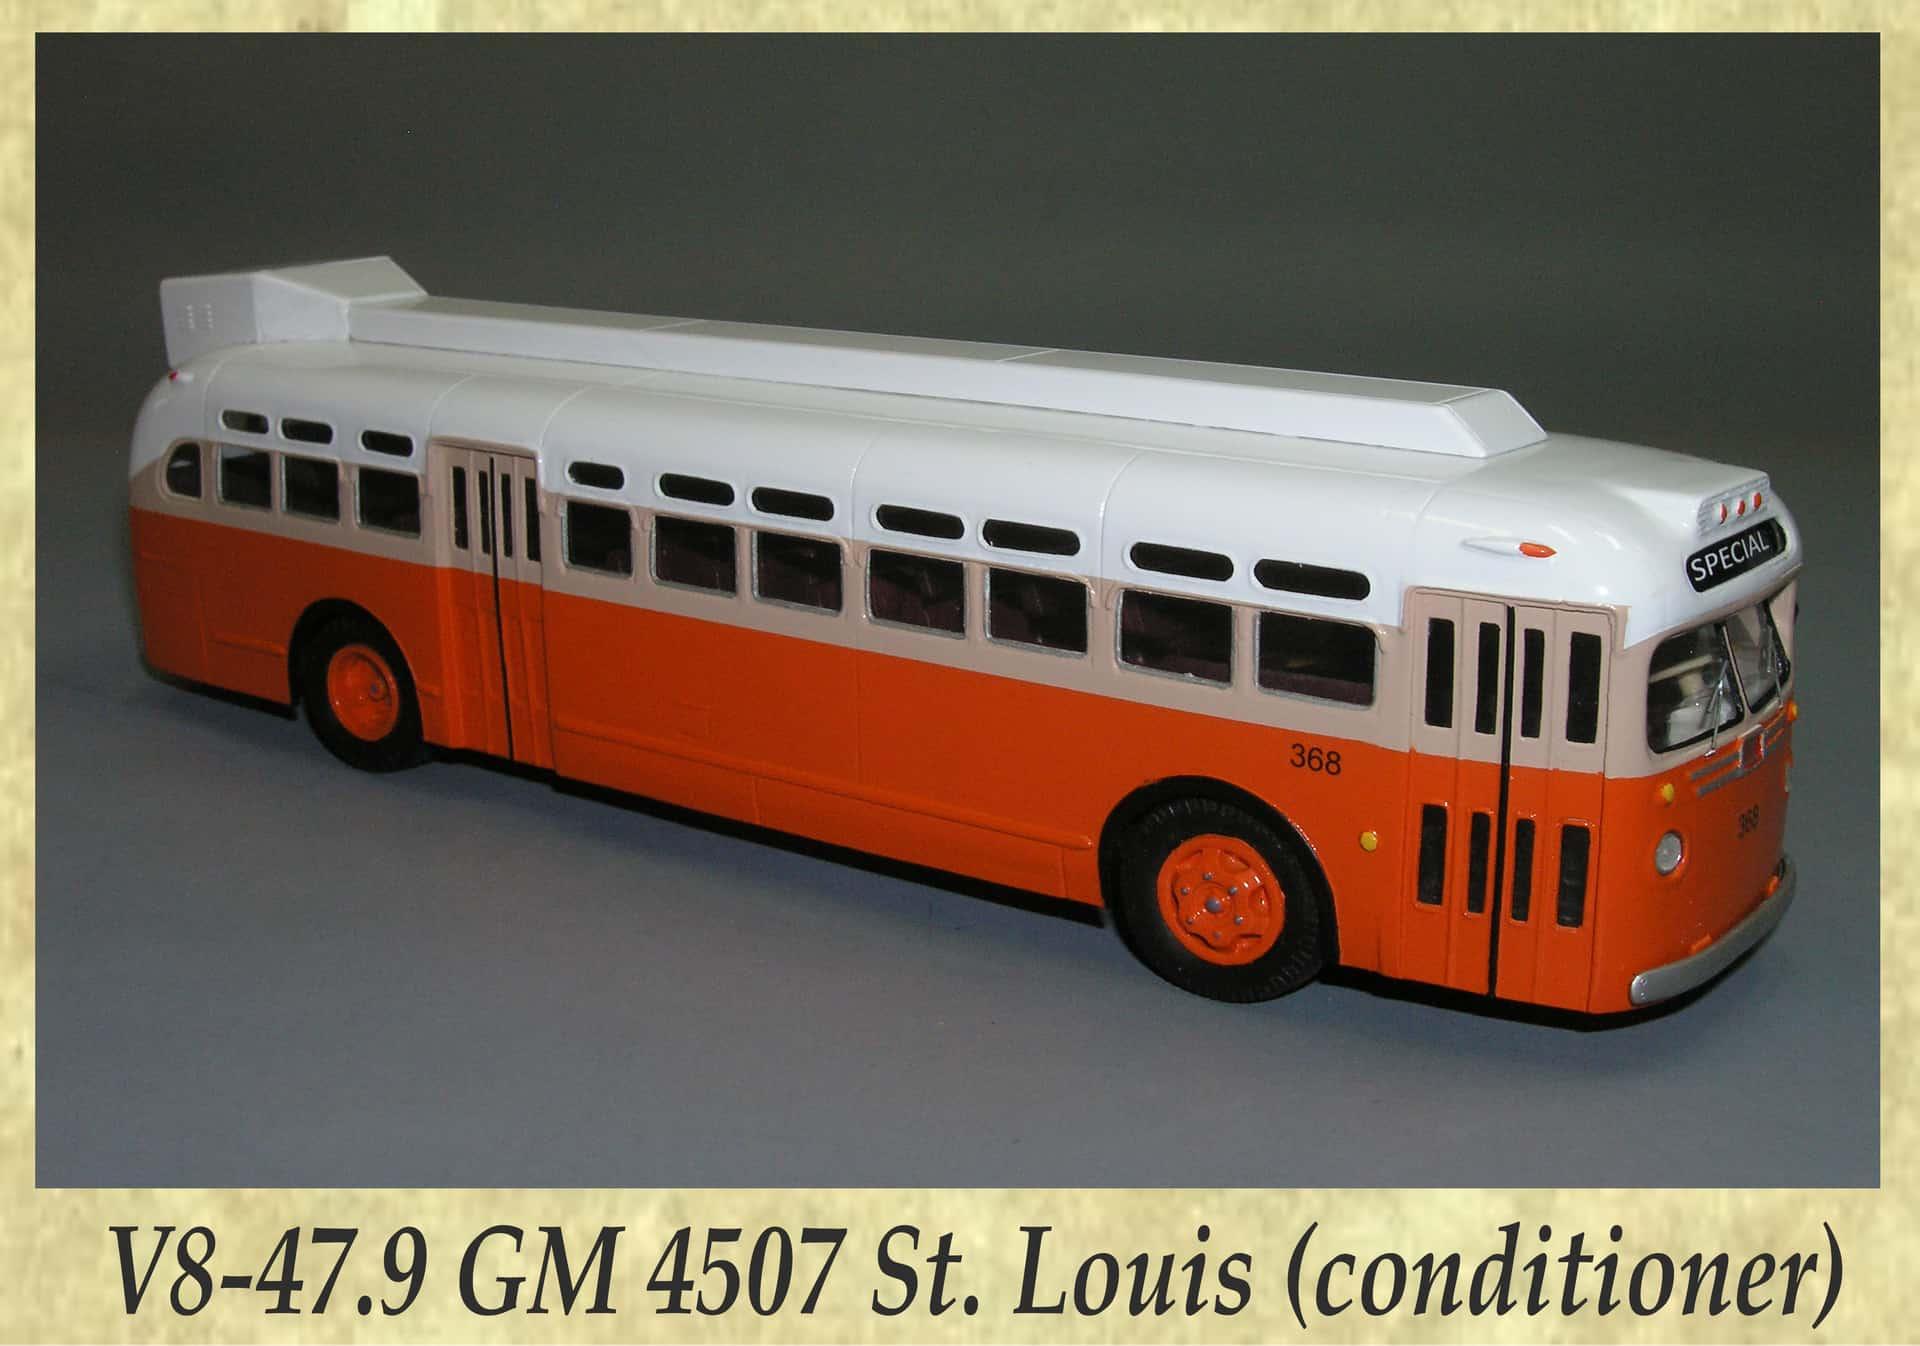 V8-47.9 GM 4507 St. Louis (conditioner)